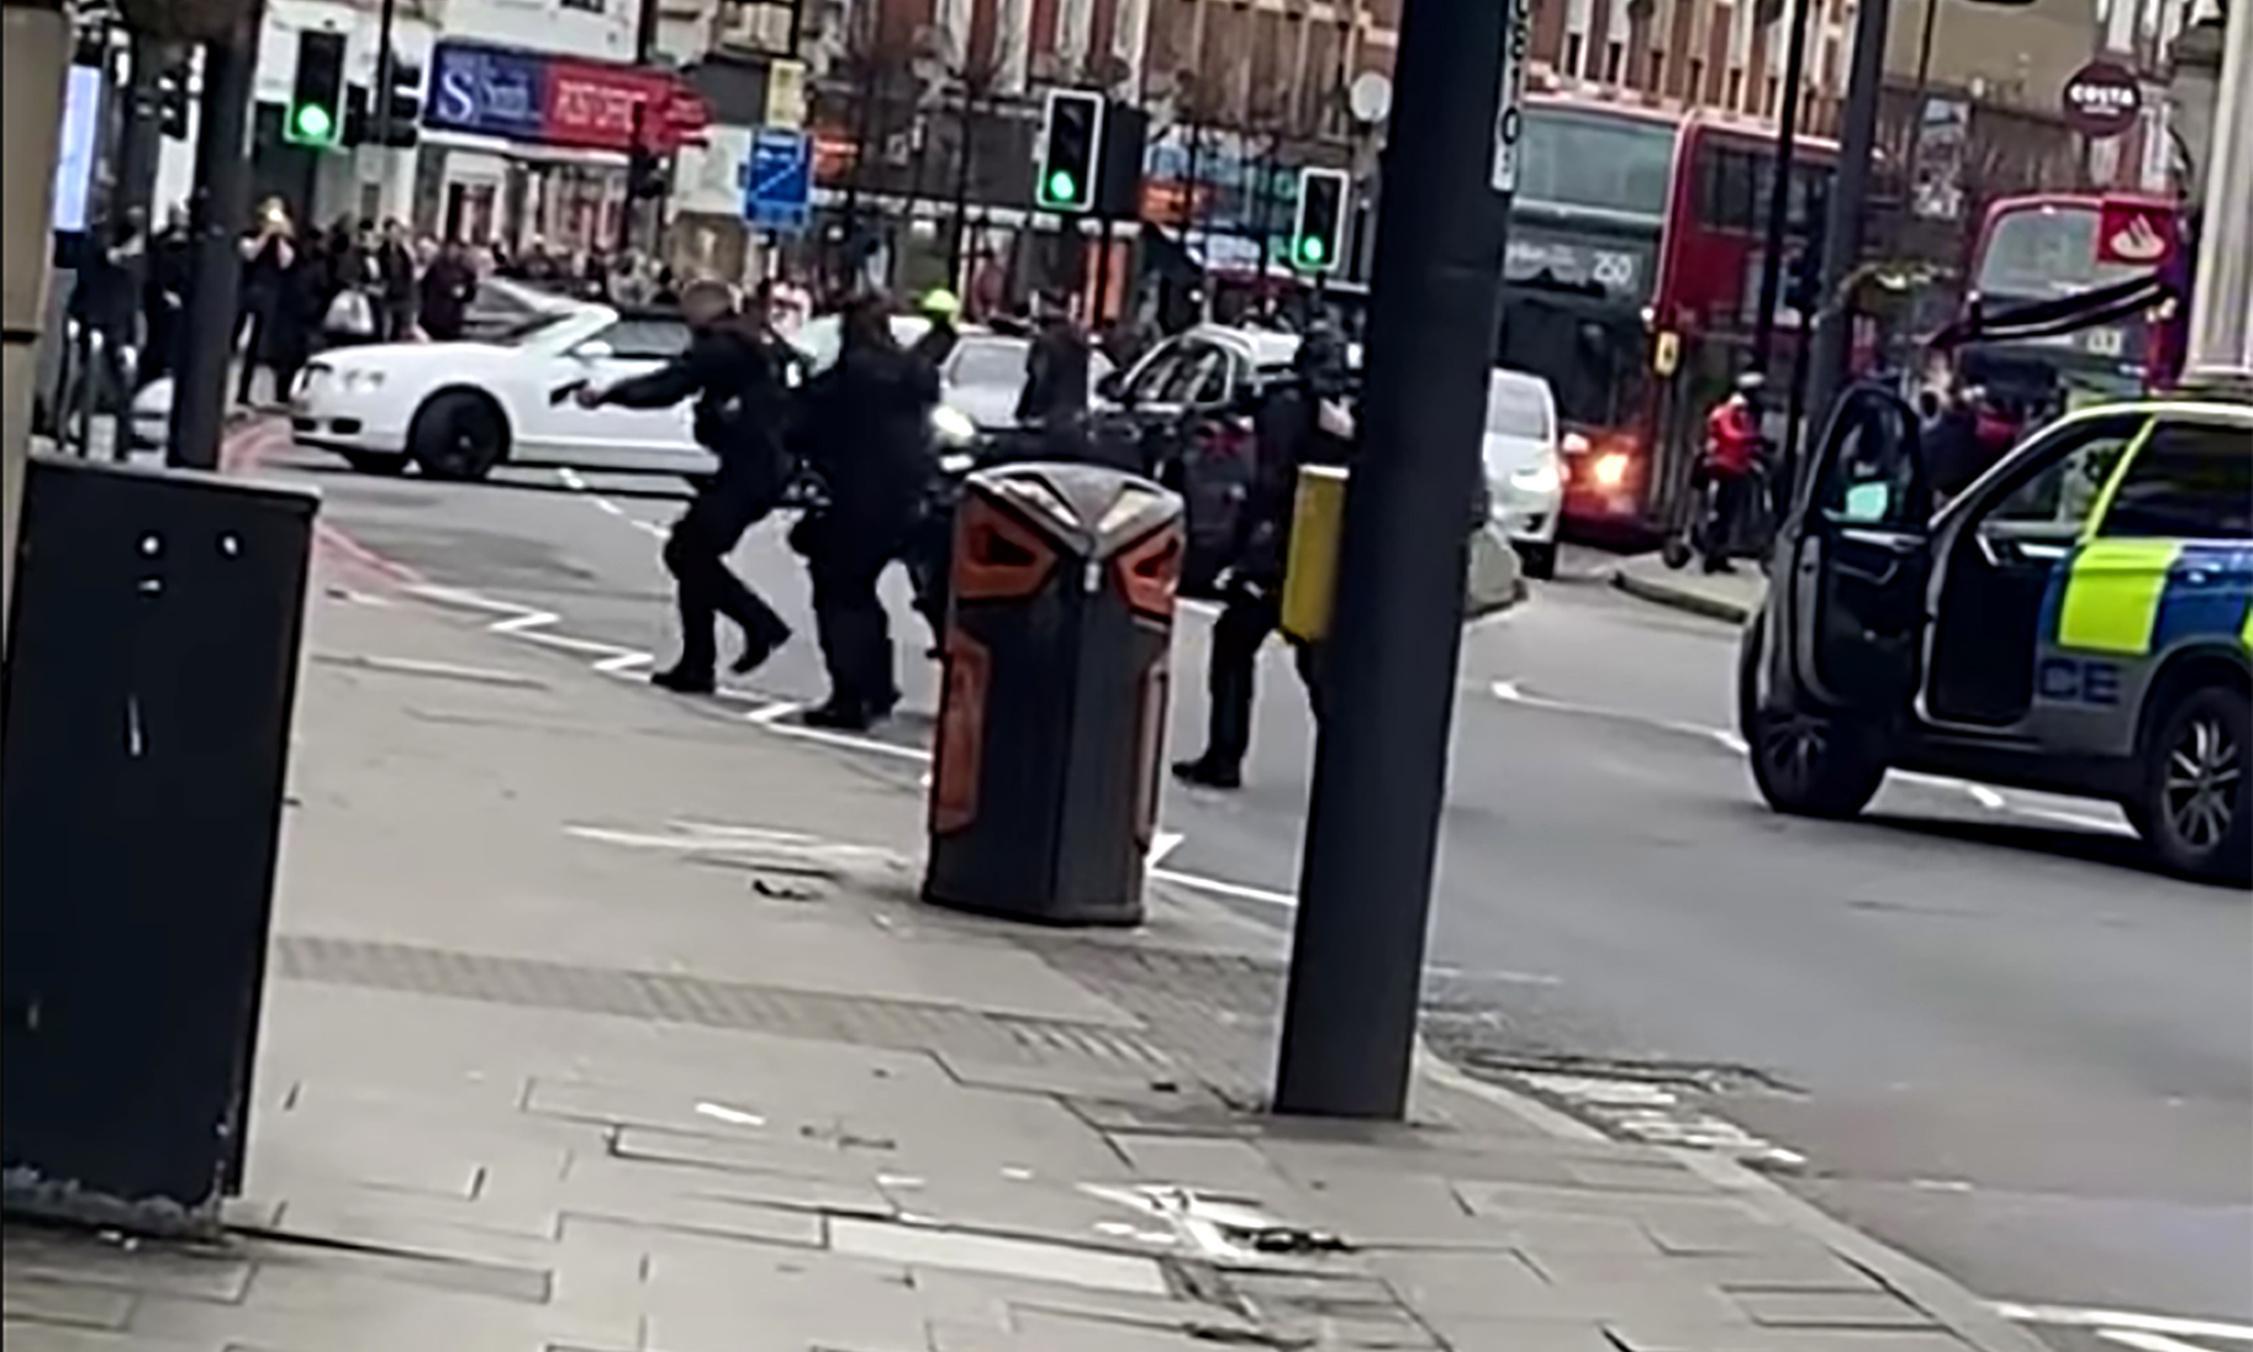 Junior police 'must make split second decisions on terrorists'